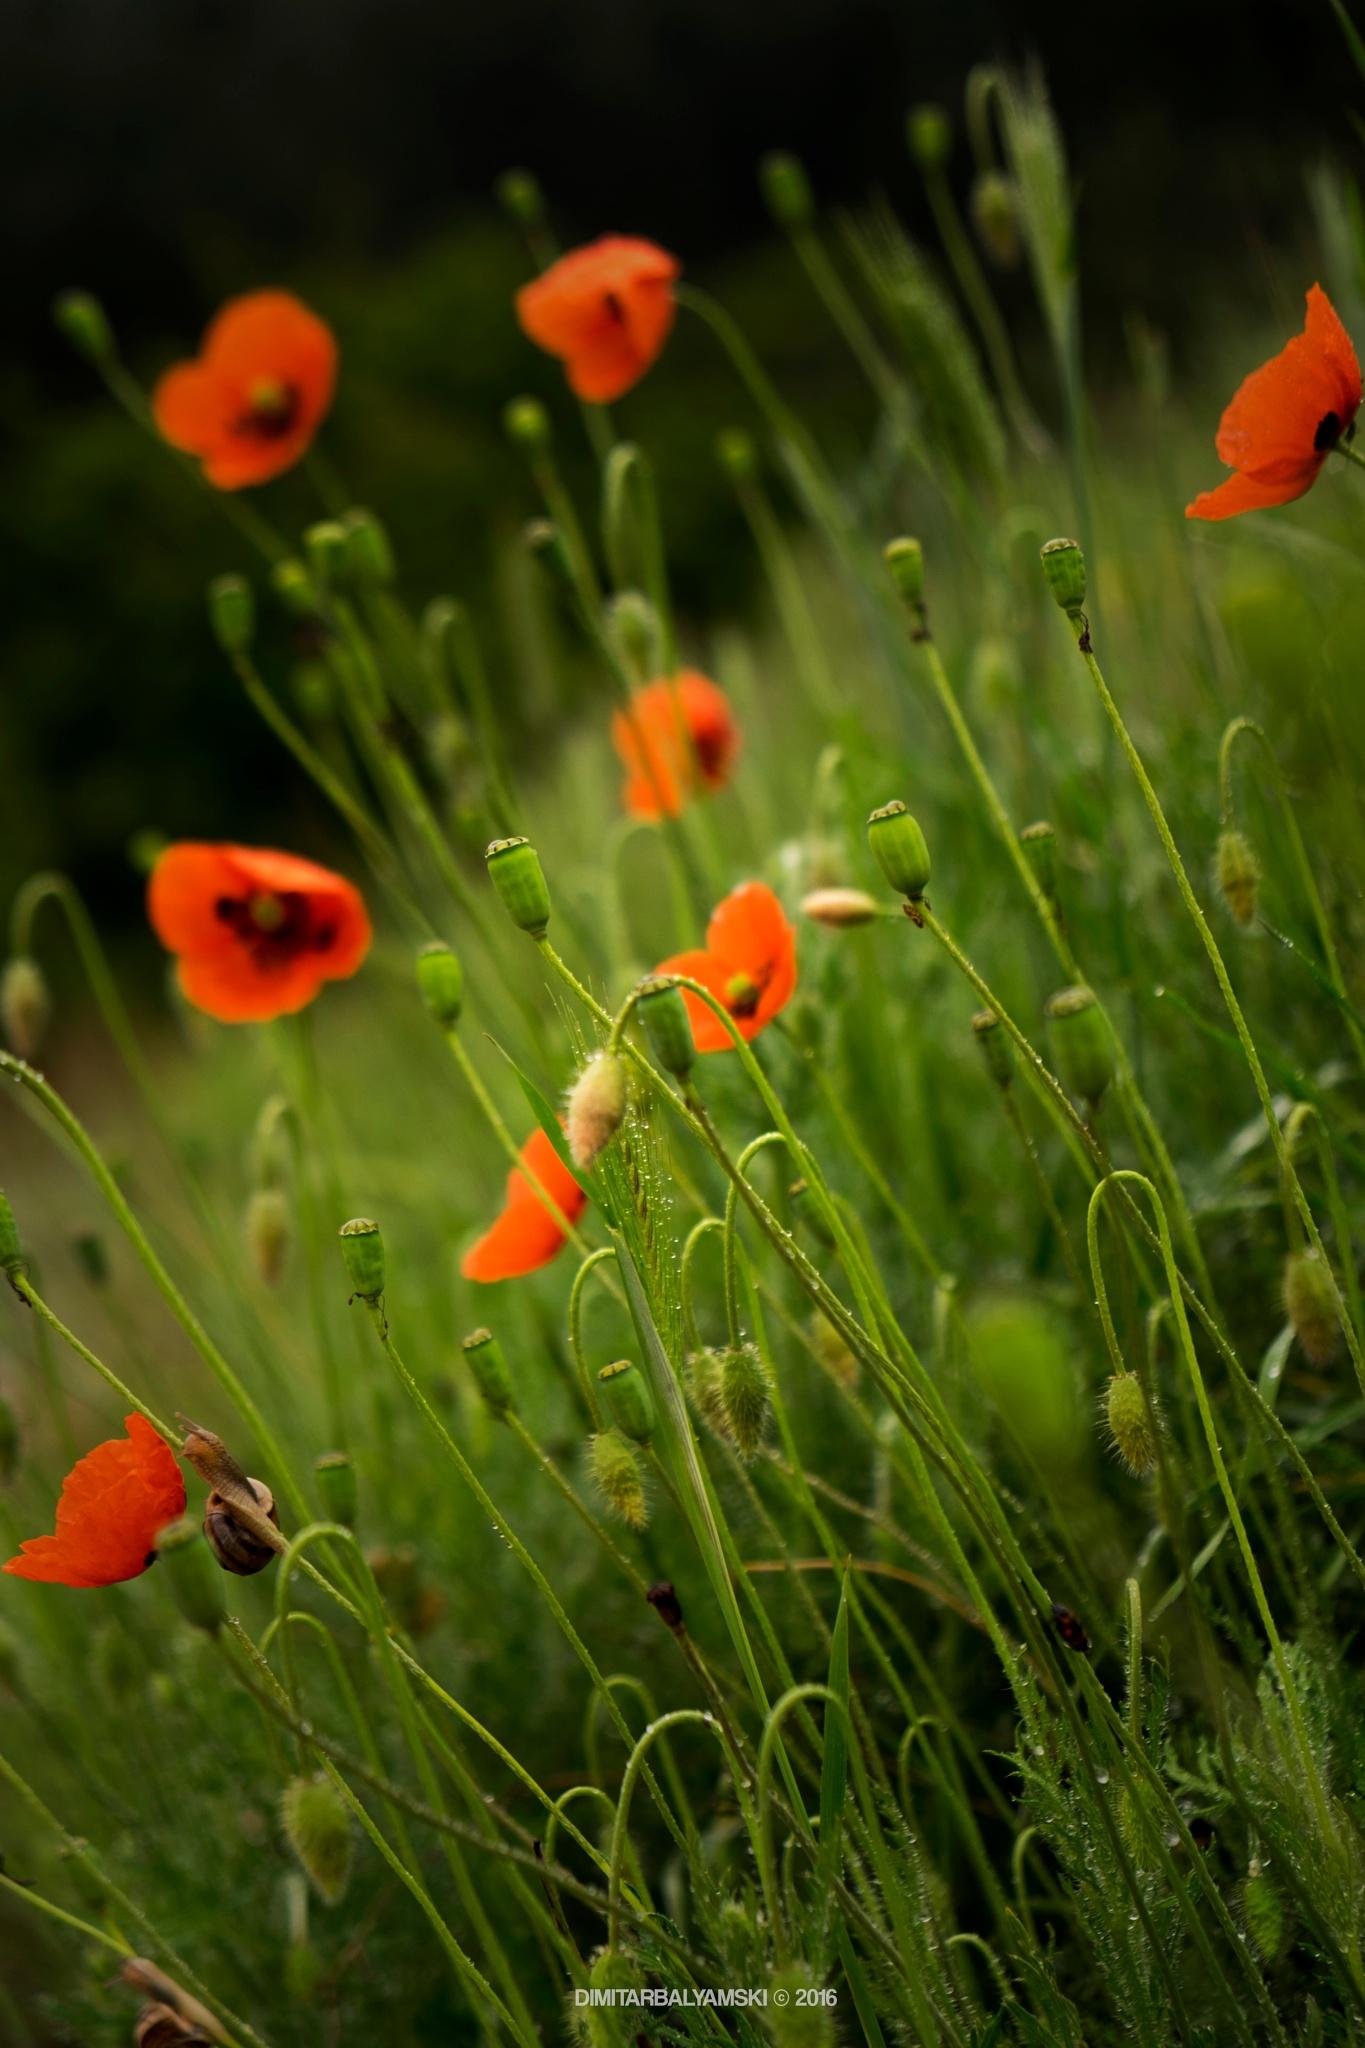 Just...poppies by Dimitar Balyamski